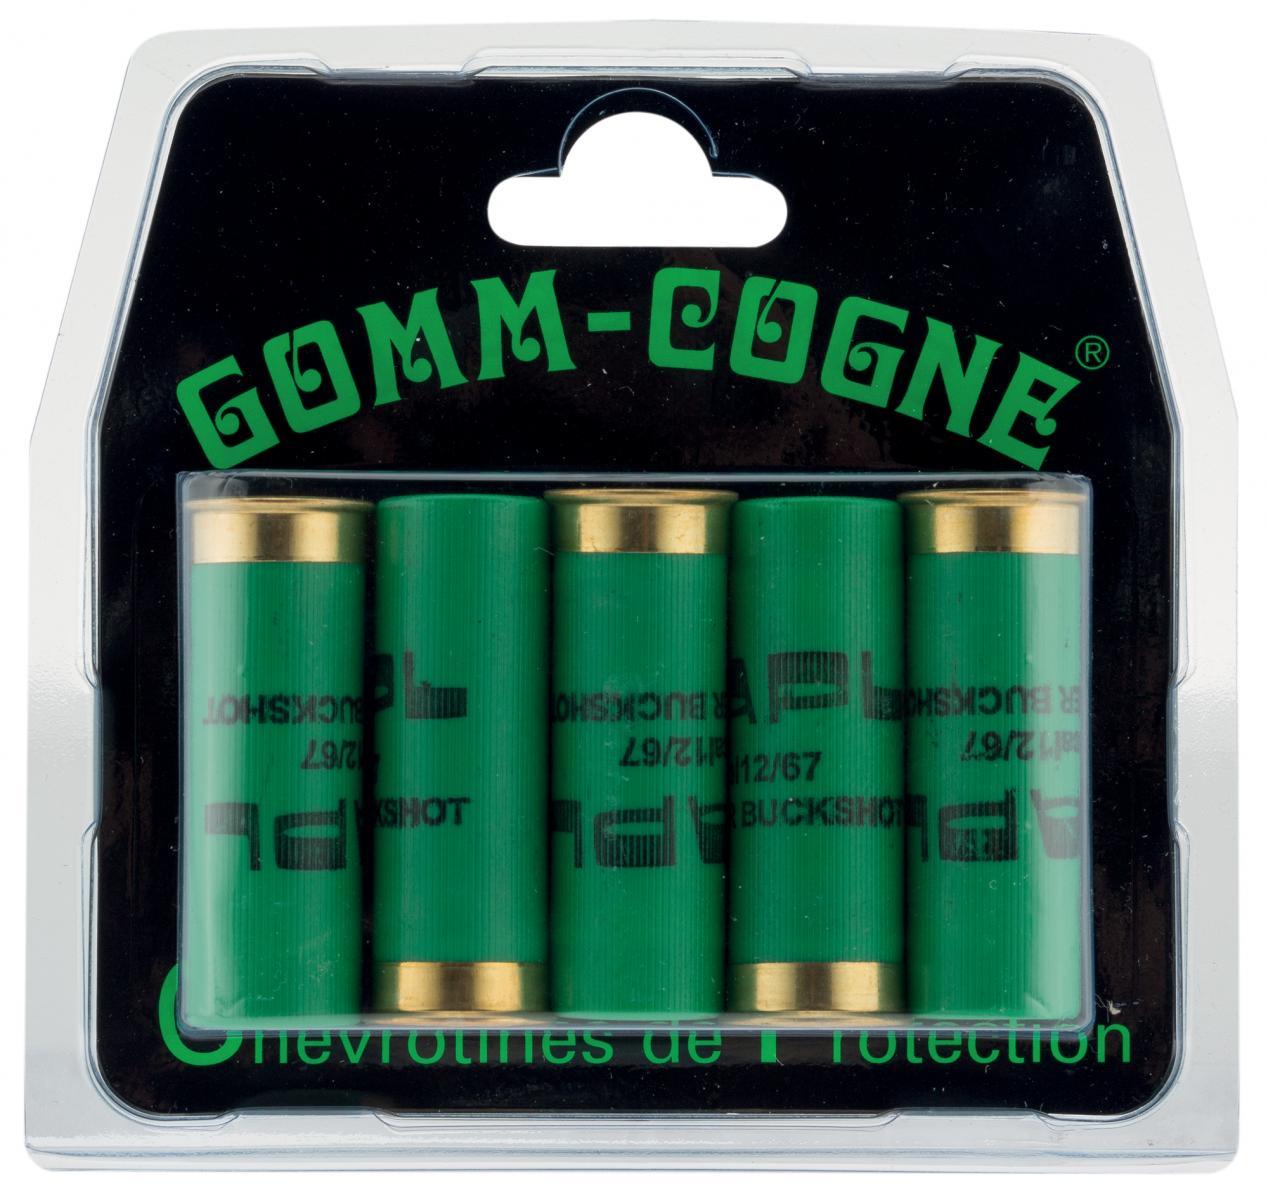 Cartouches chevrotine GOMM-COGNE 12/67mm SAPL12012